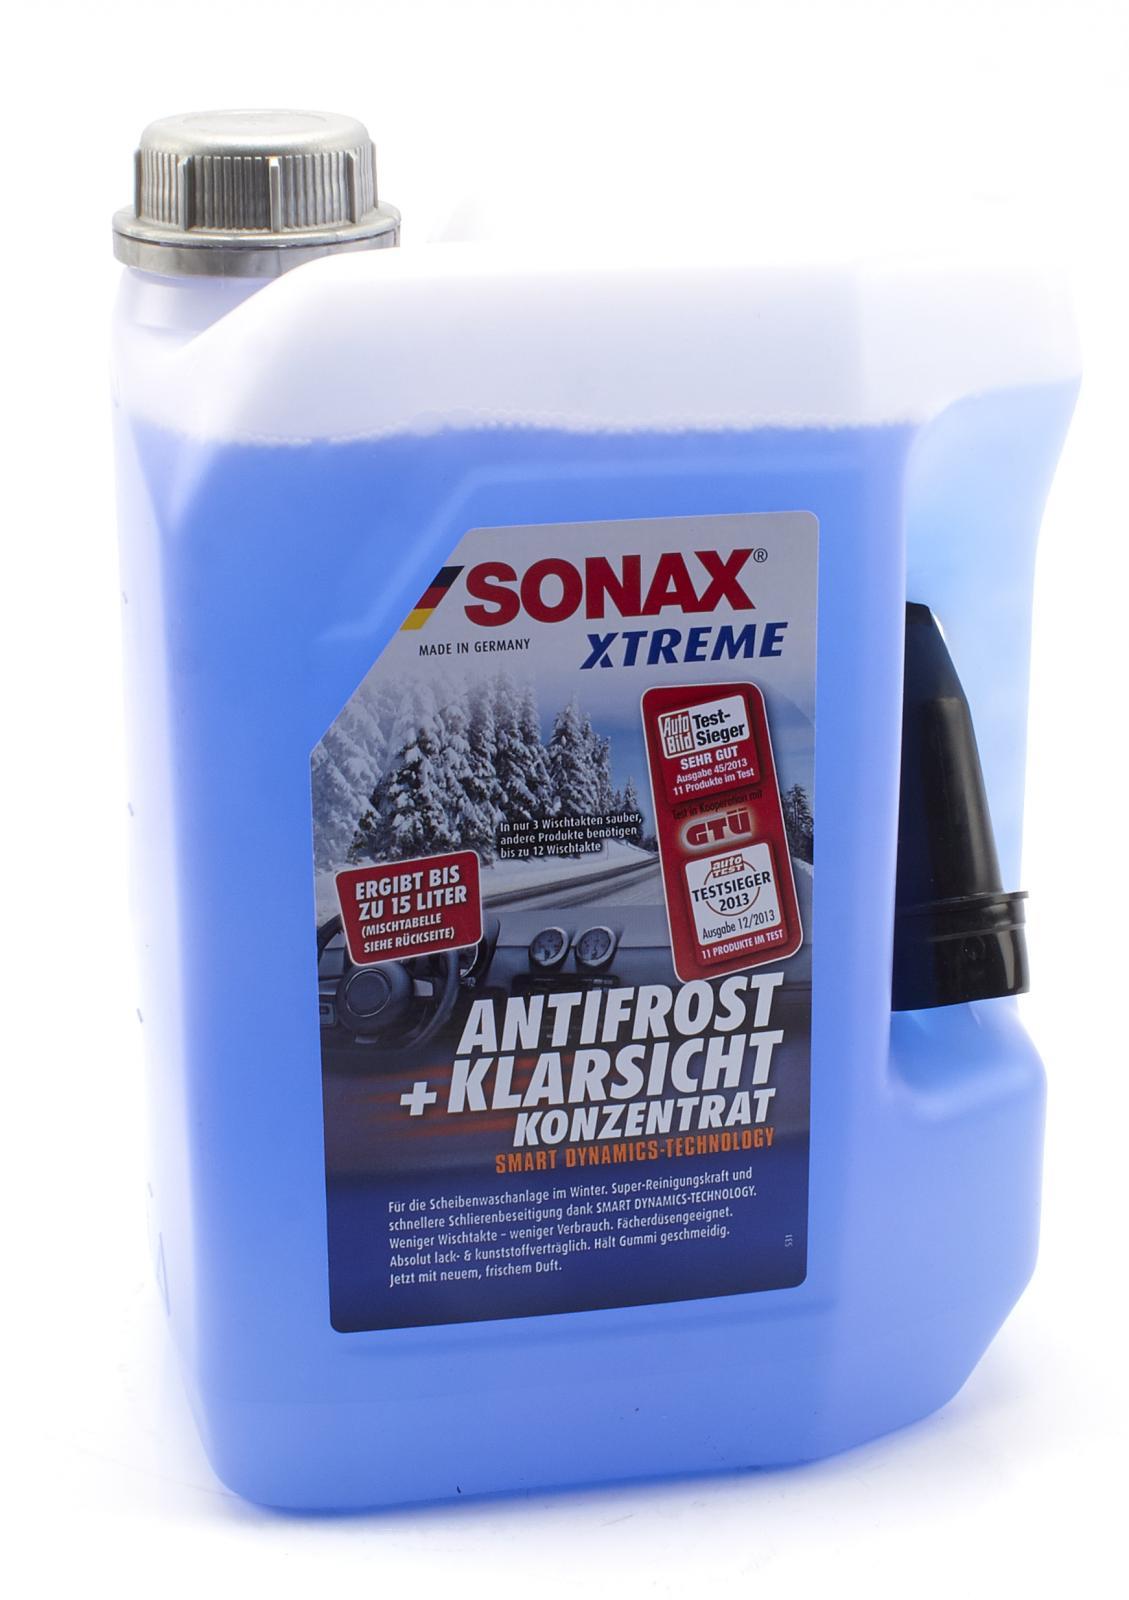 5l sonax 232 505 sonax xtreme nanopro antifrost 232505 ebay. Black Bedroom Furniture Sets. Home Design Ideas